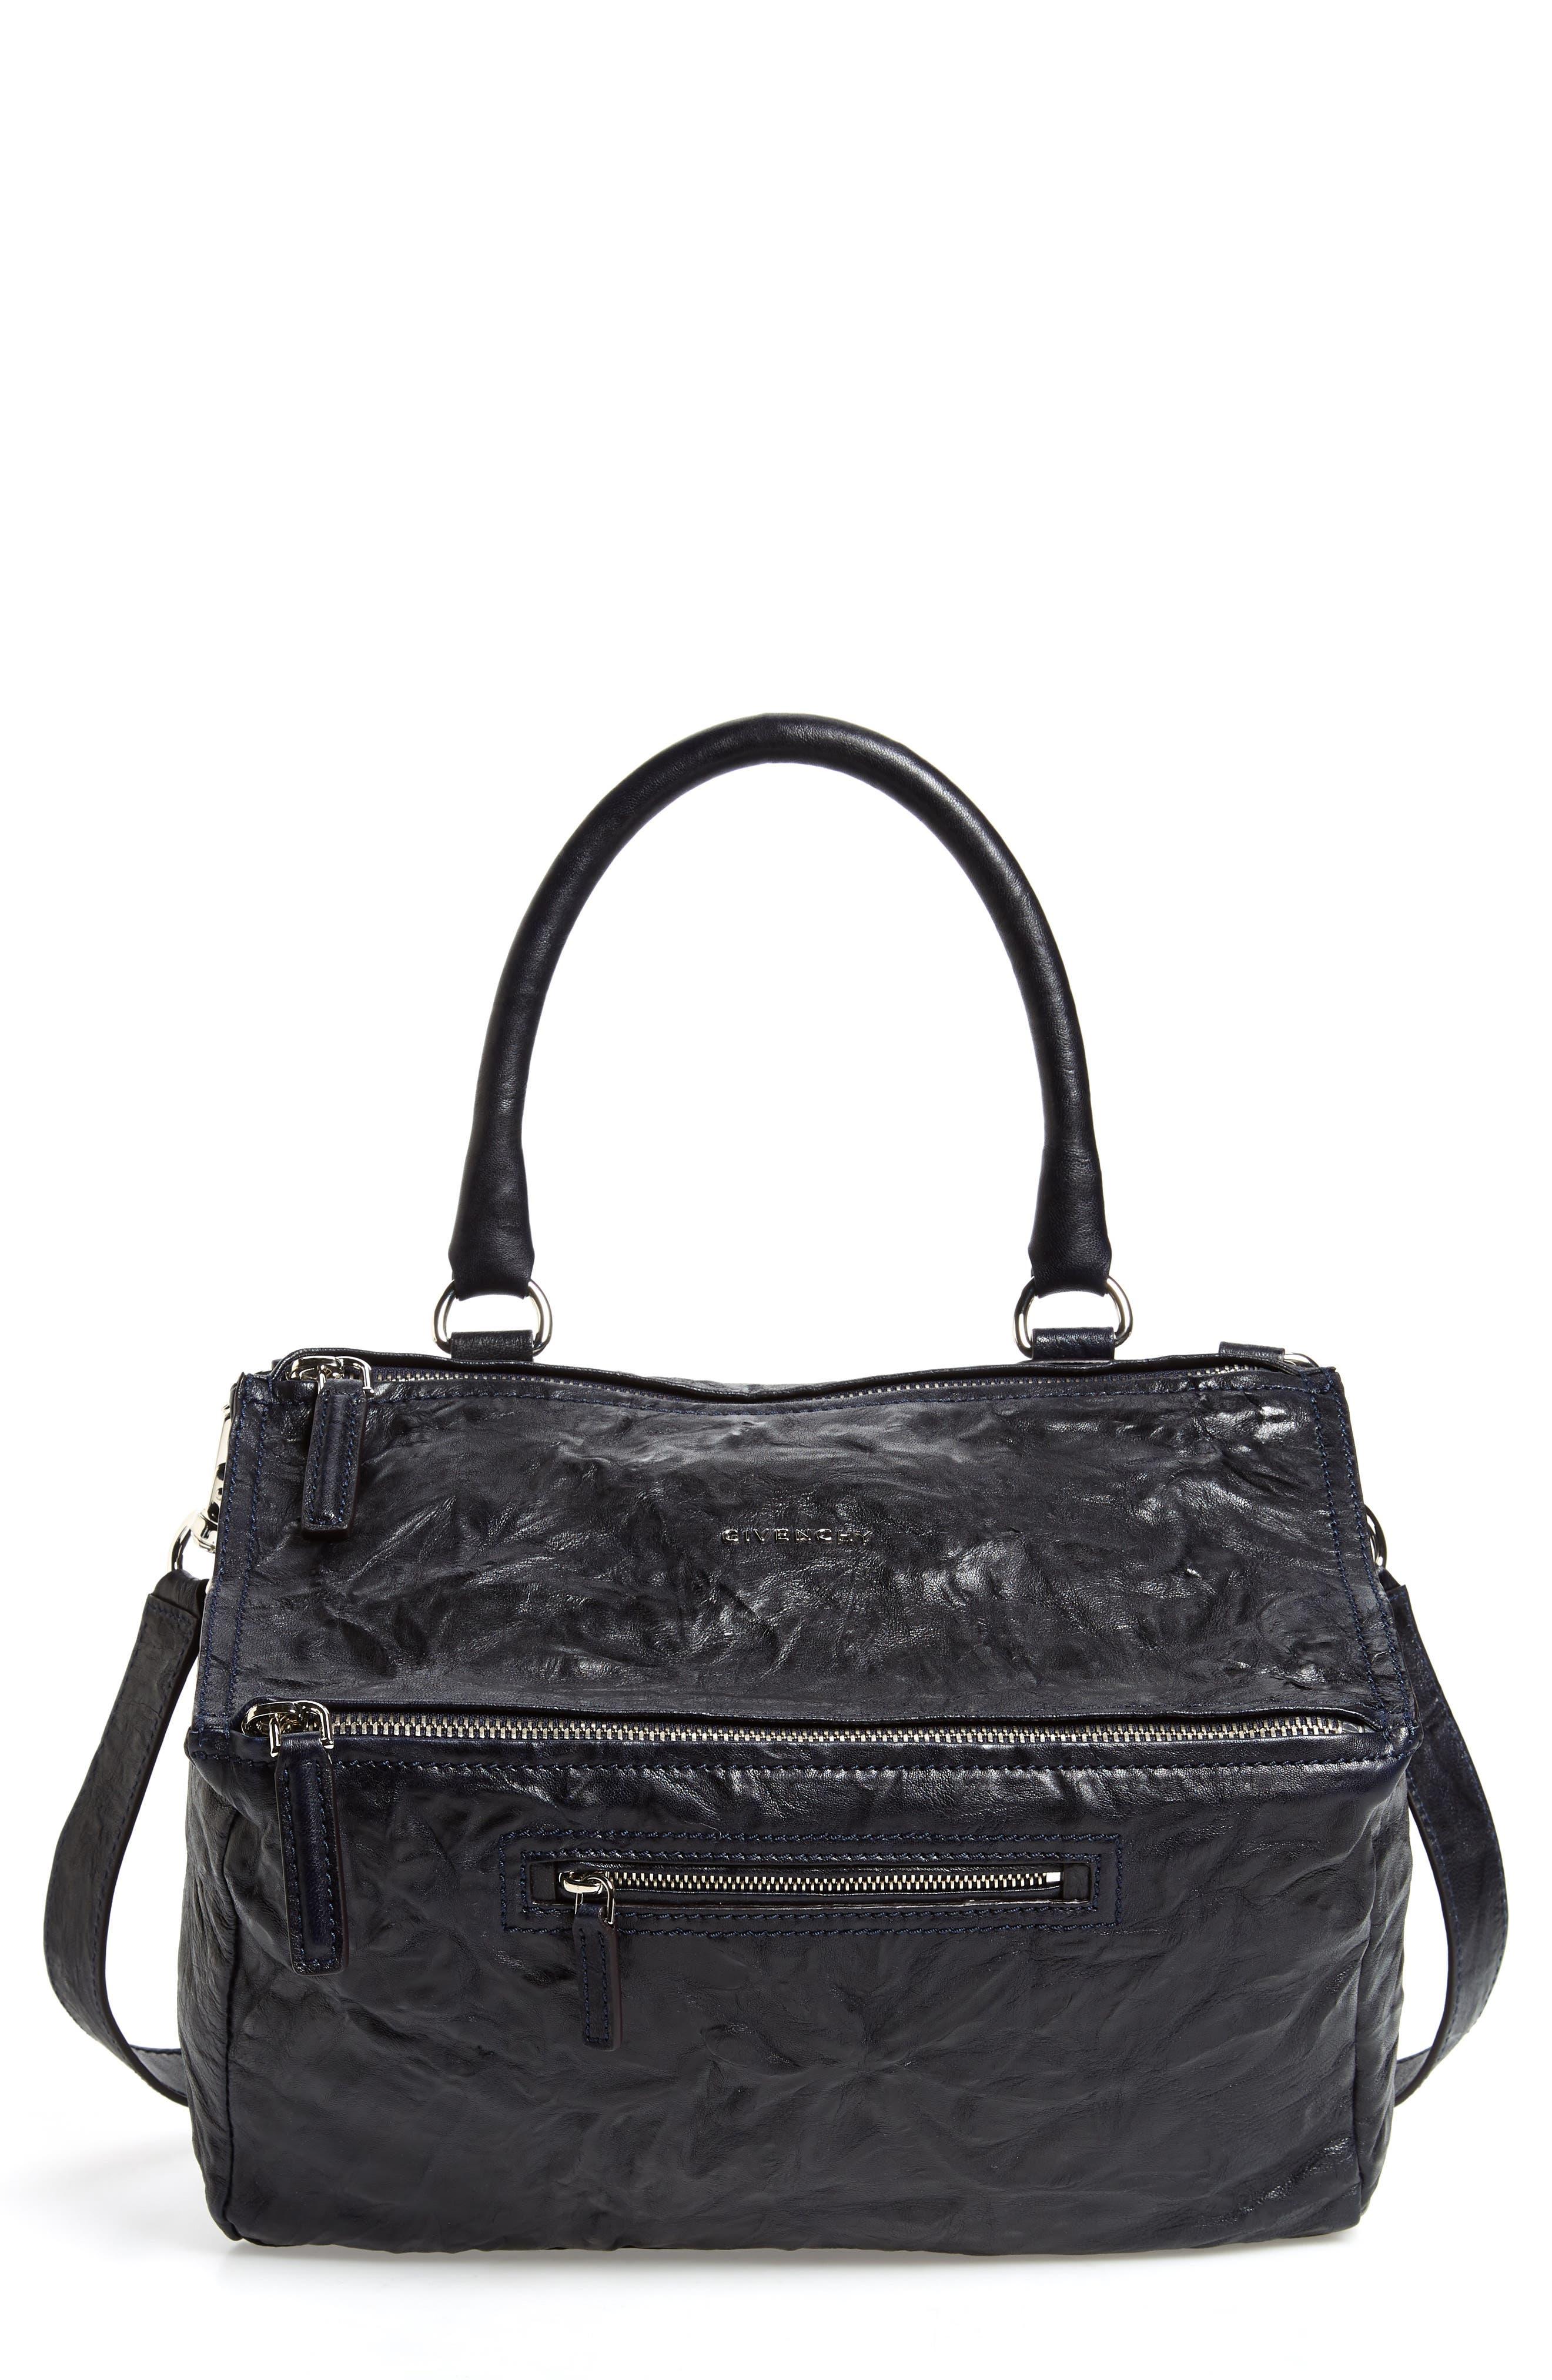 'Medium Pepe Pandora' Leather Satchel,                             Main thumbnail 1, color,                             Dark Blue